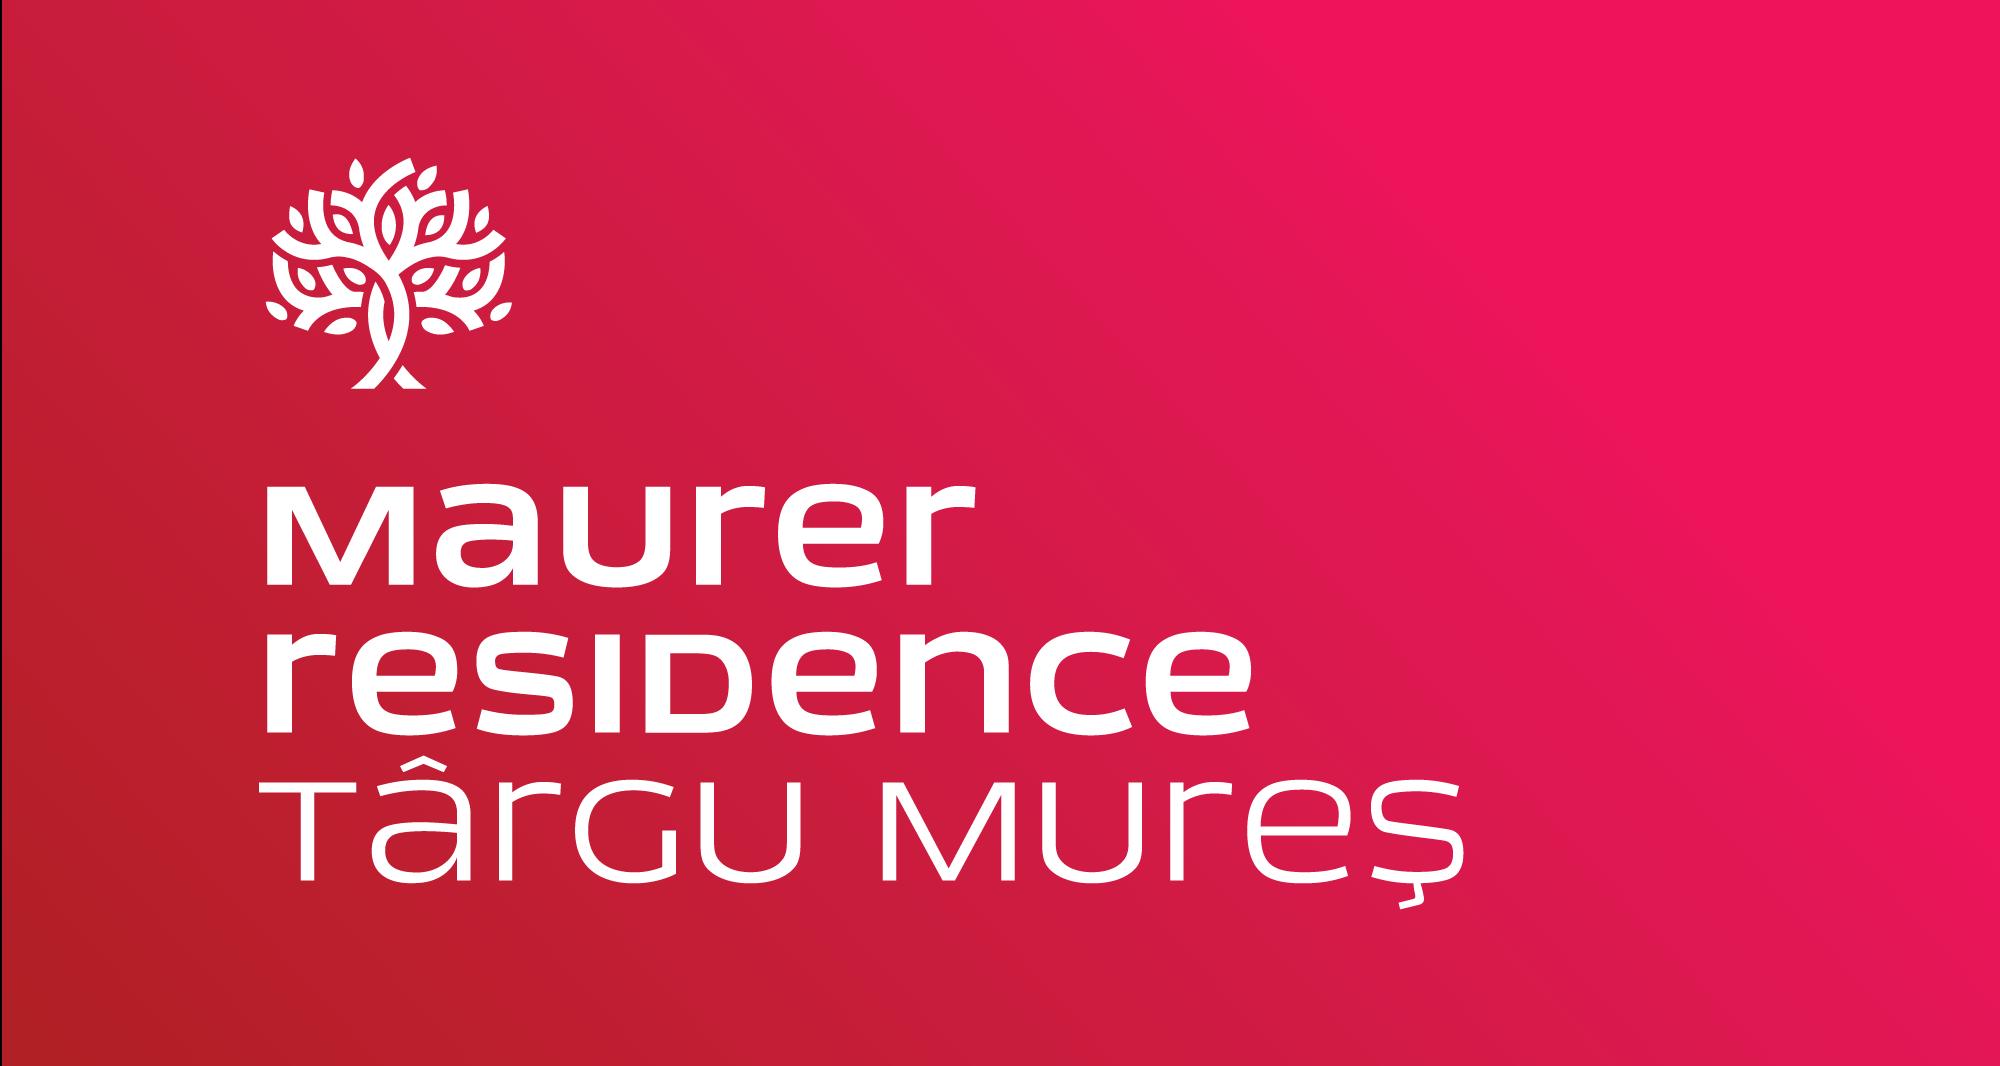 Maurer Residence Targu Mures